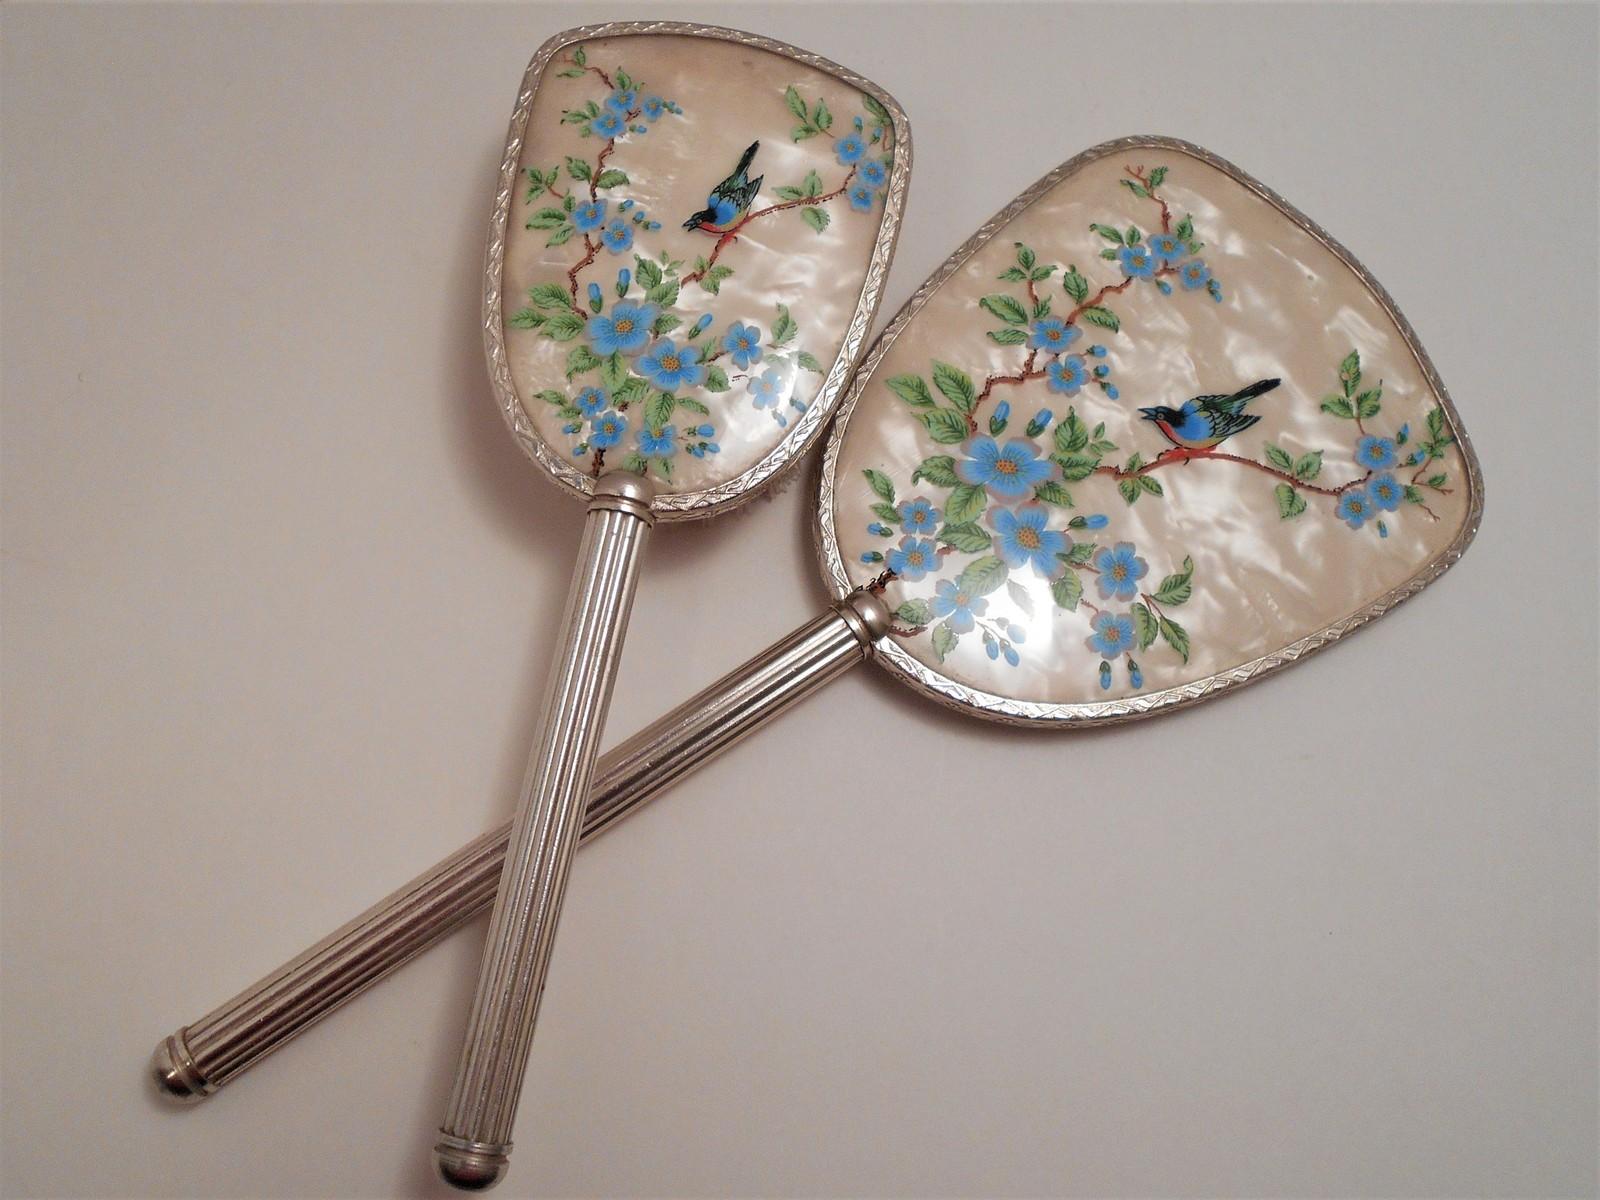 Vintage Bird Picture Hand Mirror & Brush Made in England